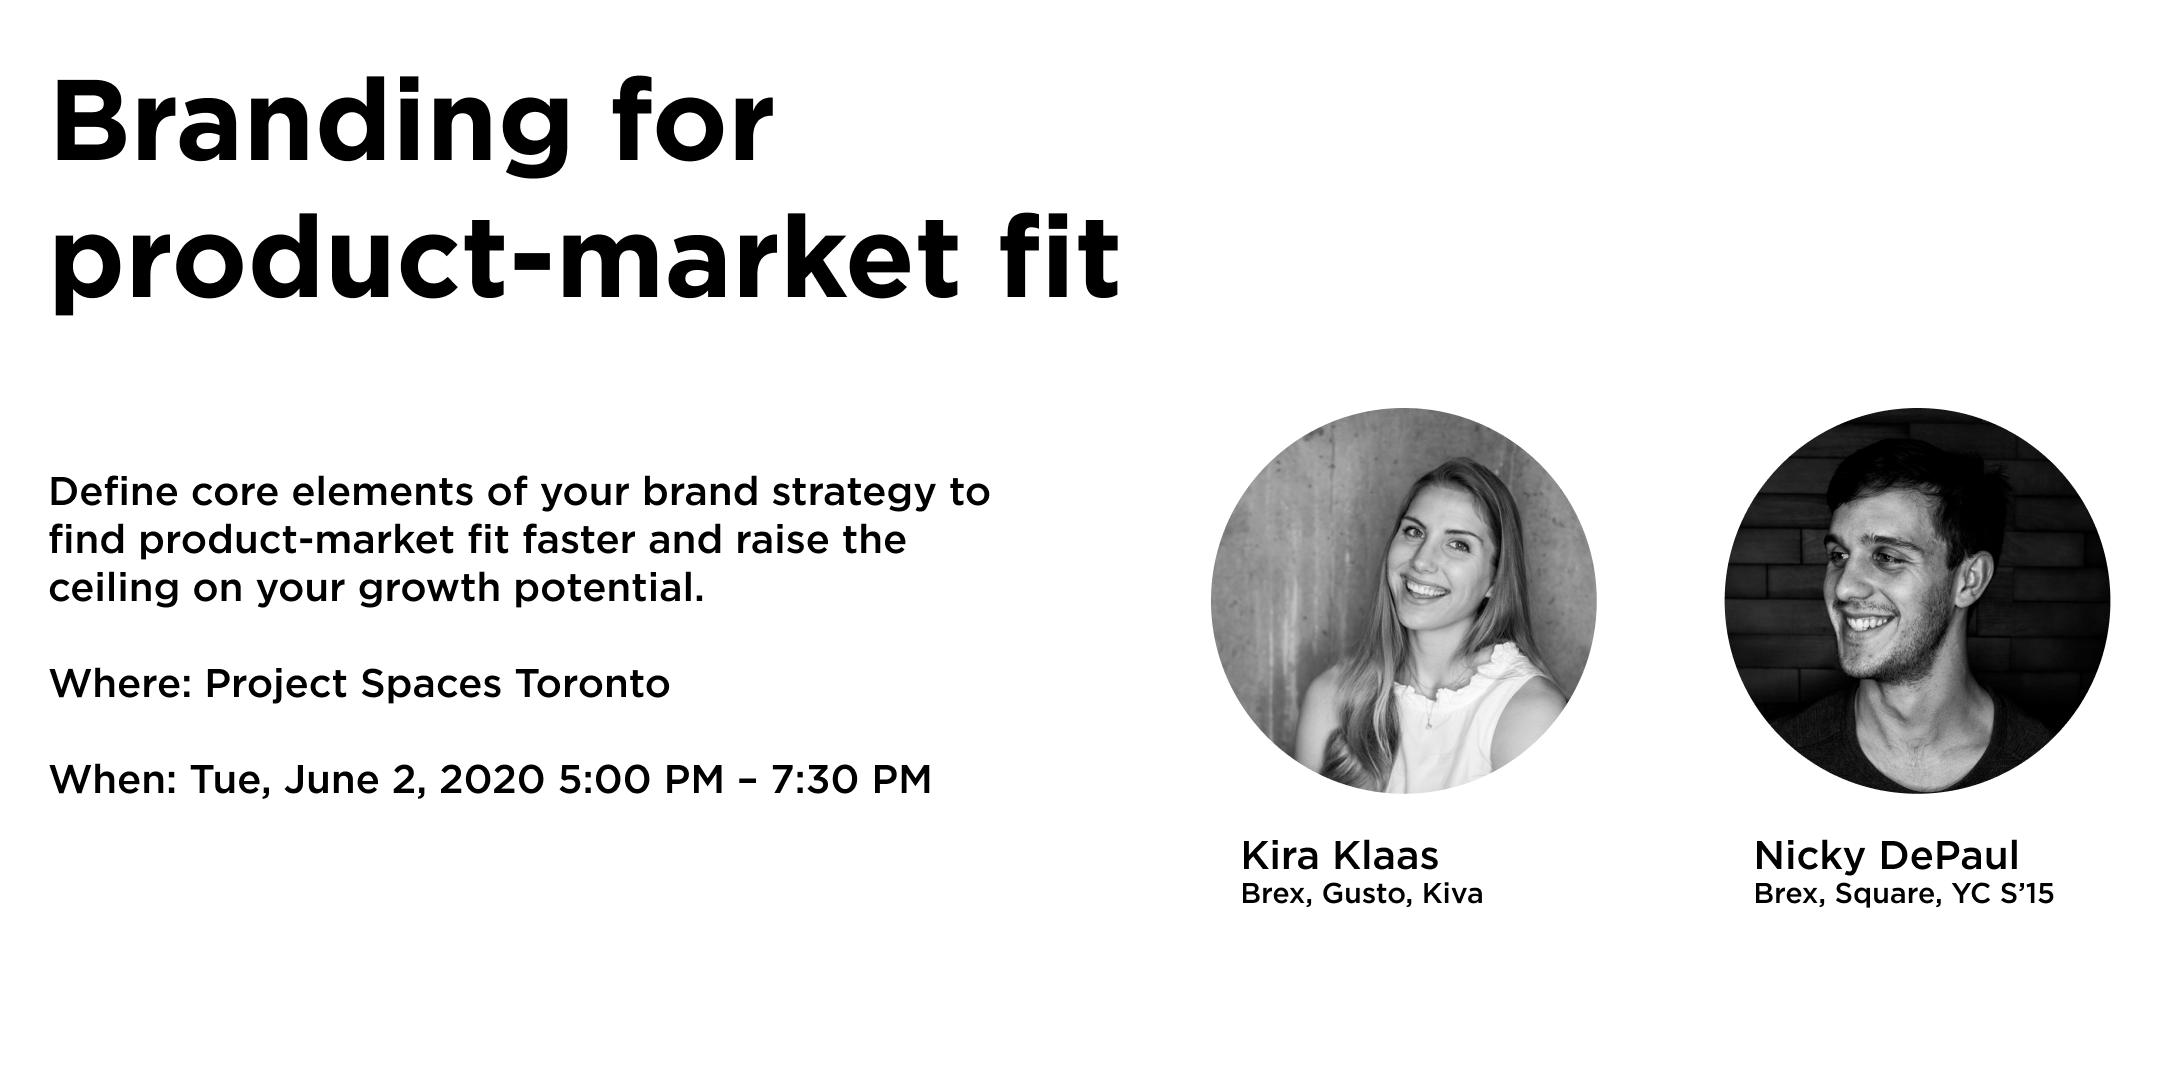 Branding for product-market fit: A workshop for startup leaders